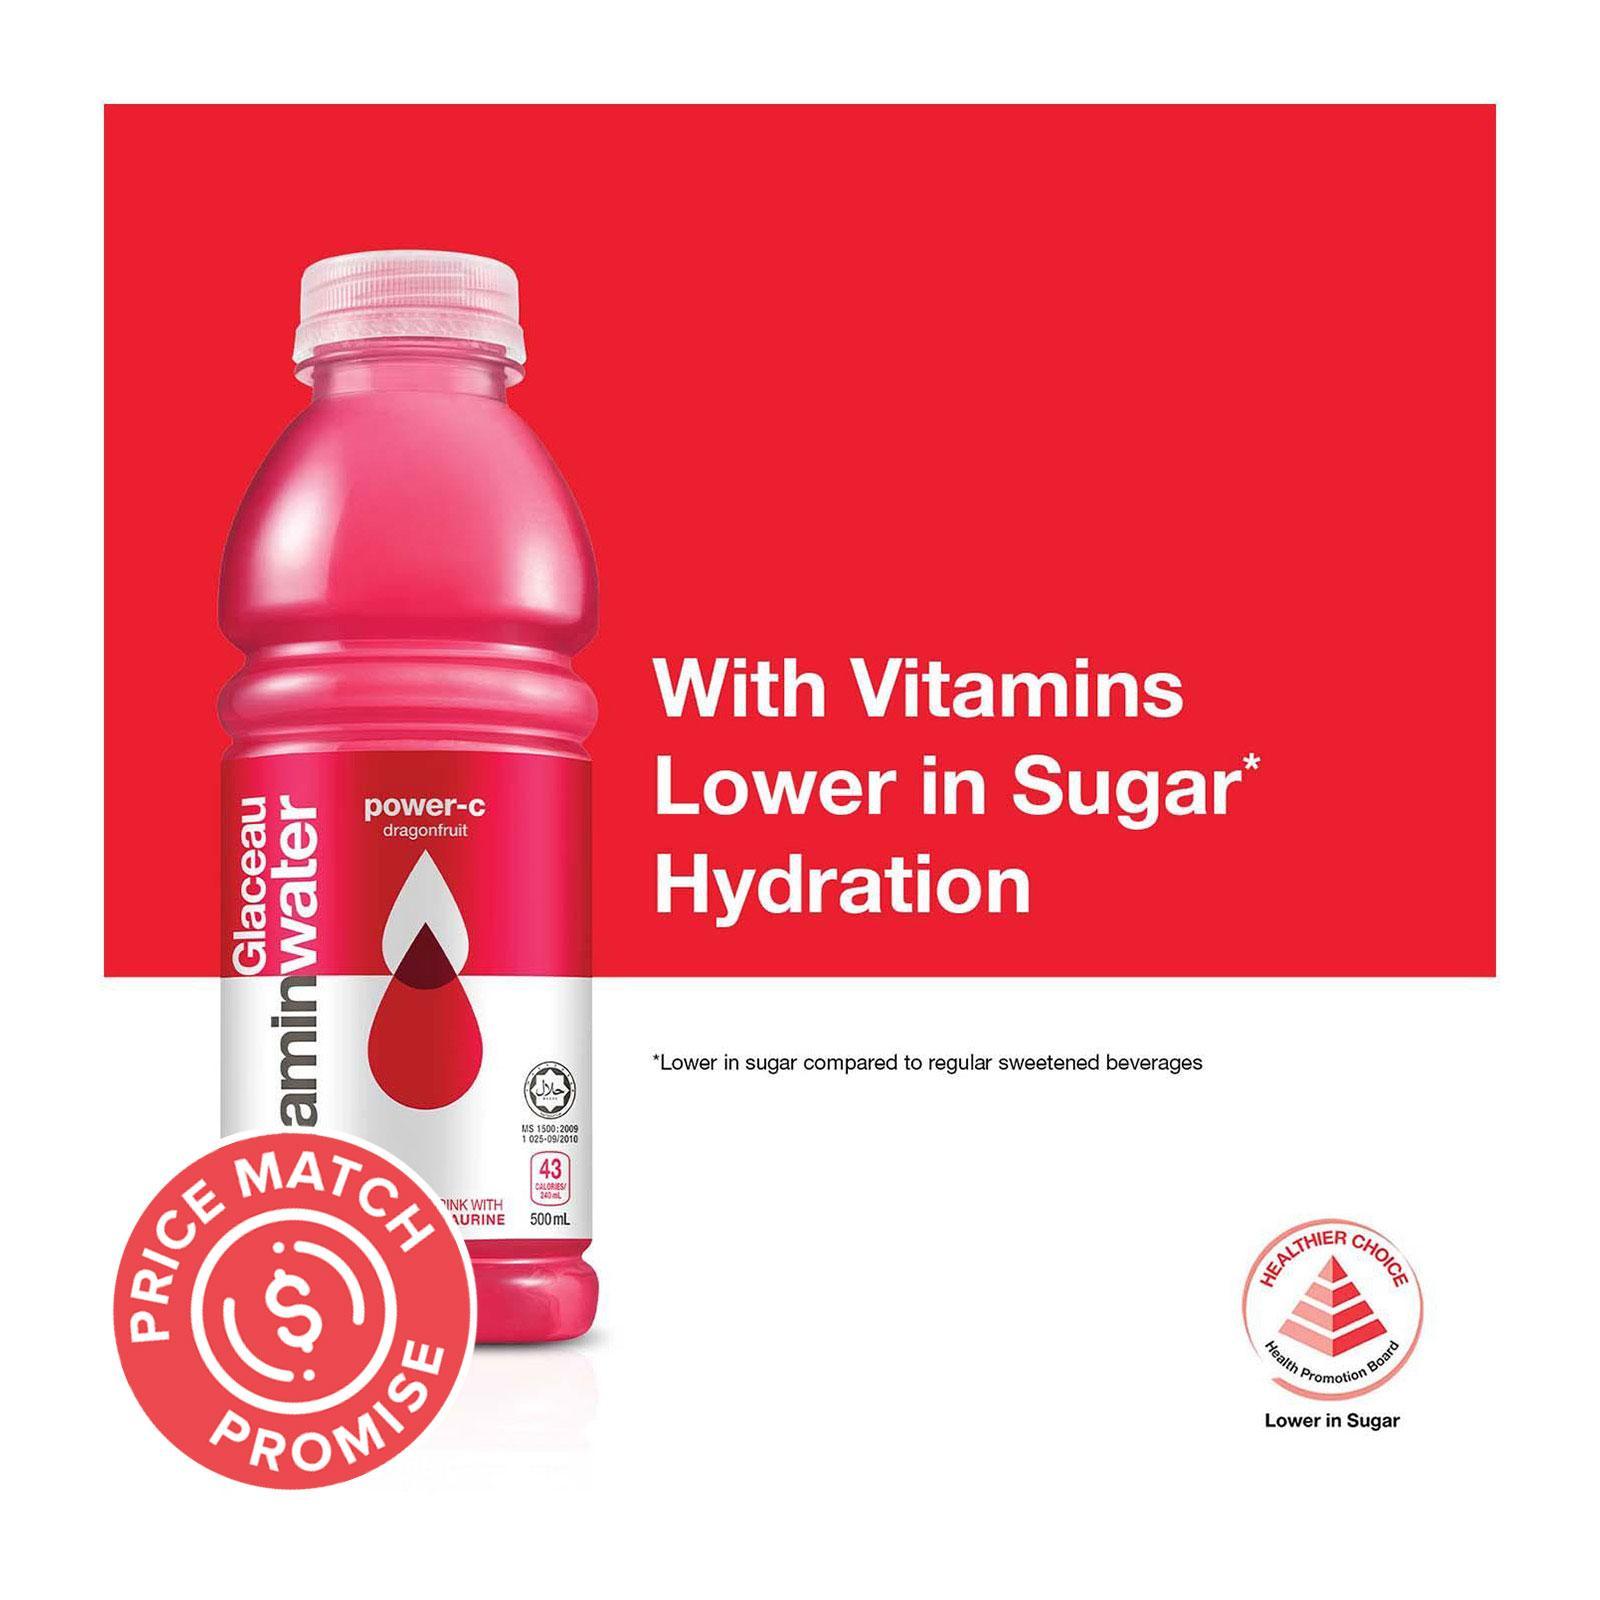 GLACEAU Vitamin Water Power-C Dragonfruit 500ml